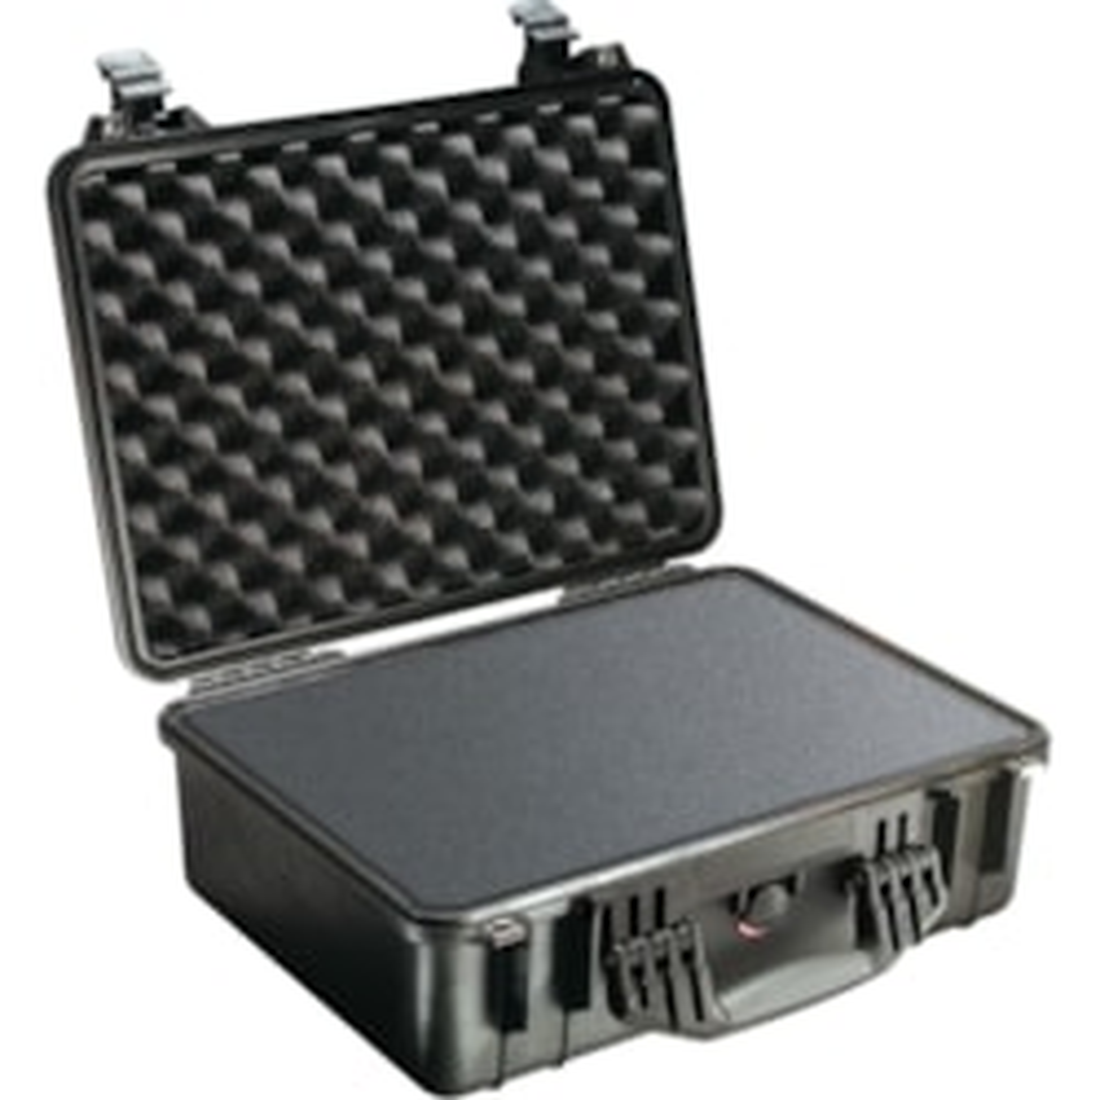 Pelican 1520 Storage Case